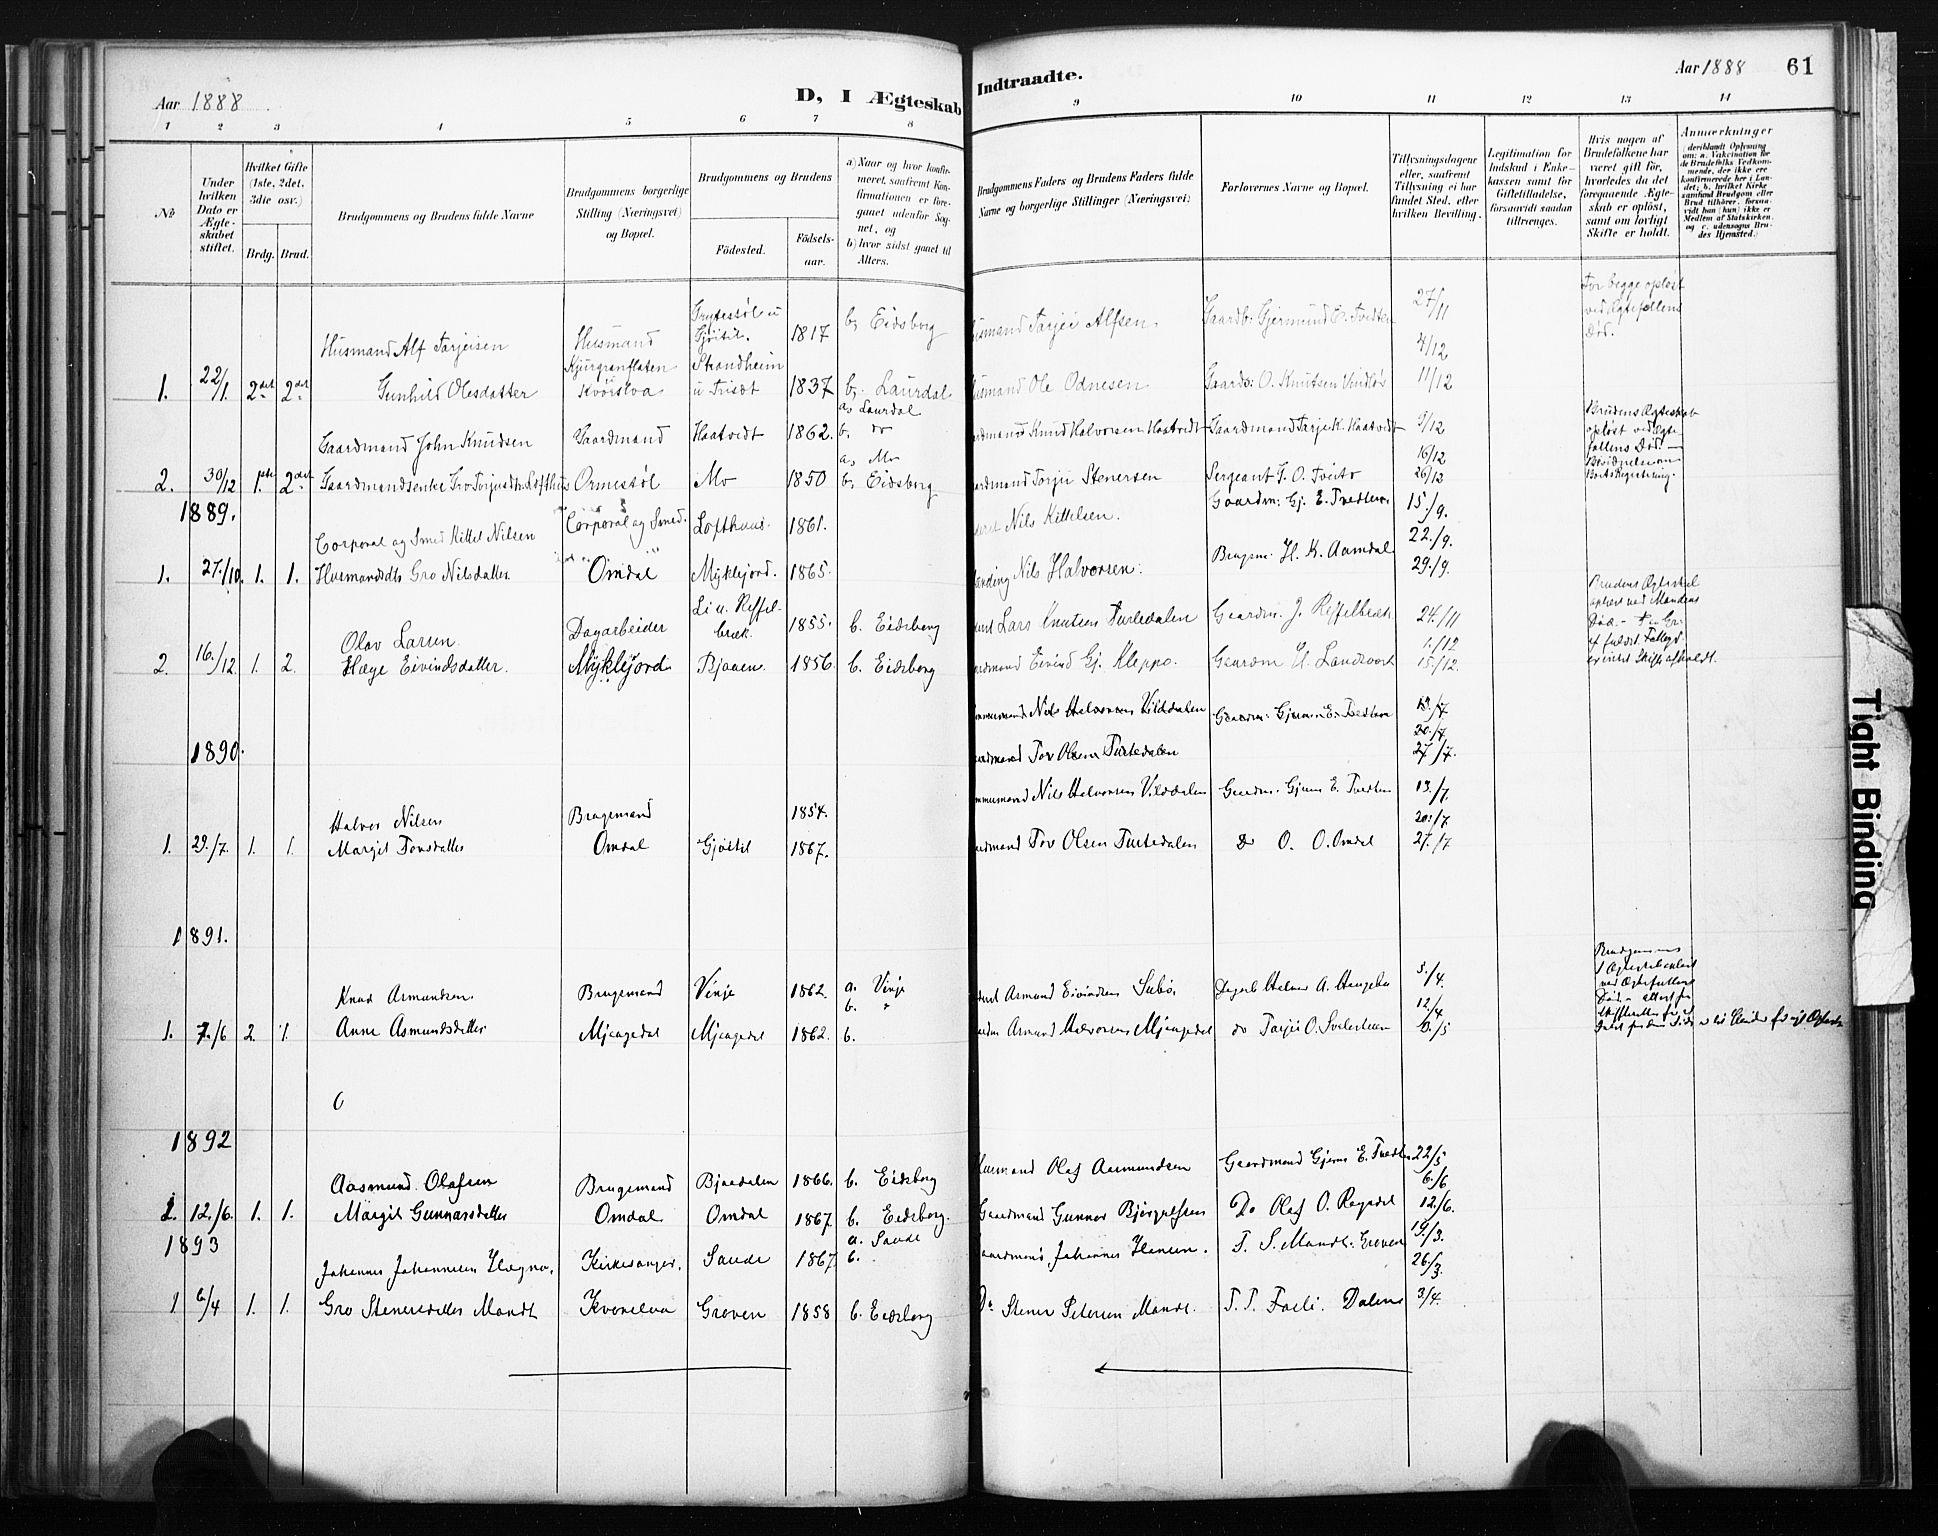 SAKO, Lårdal kirkebøker, F/Fb/L0002: Ministerialbok nr. II 2, 1887-1918, s. 61